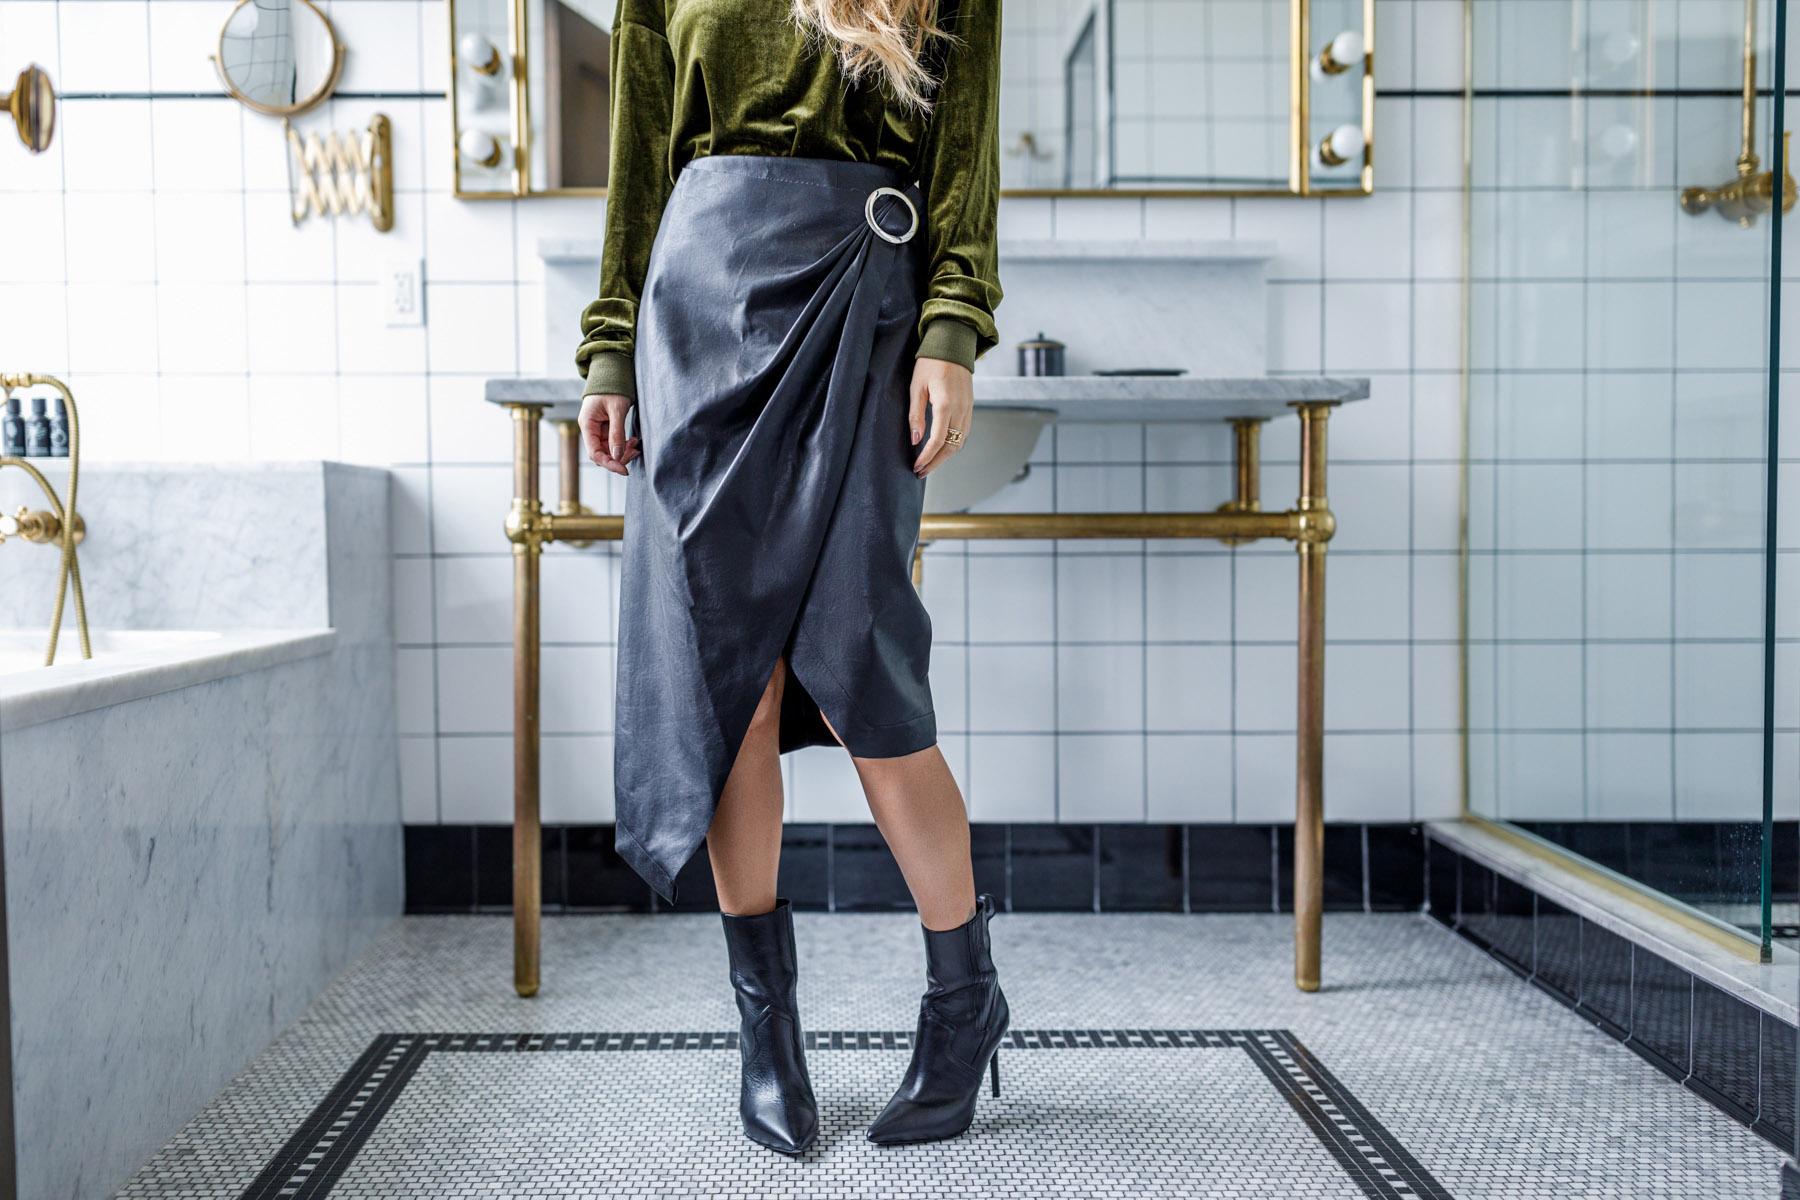 Dazzine Velvet Perfect Winter Fashion // NotJessFashion.com